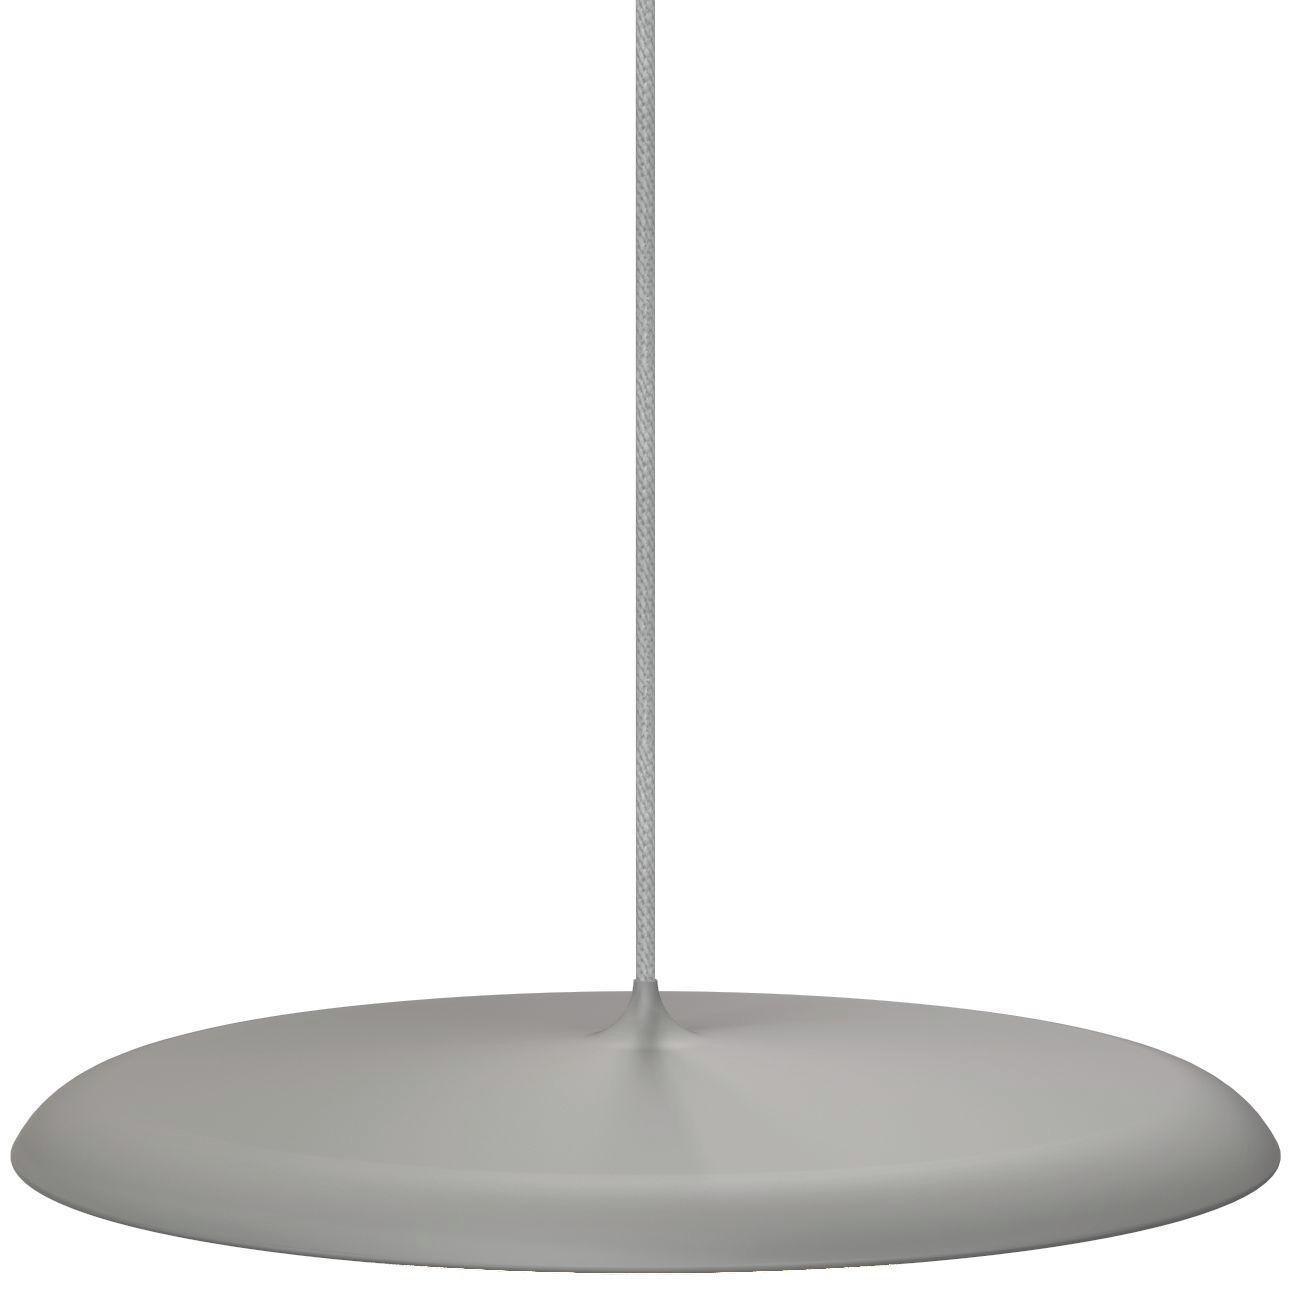 LED-HÄNGELEUCHTE - Dunkelgrau, Design, Kunststoff/Metall (40/6cm)